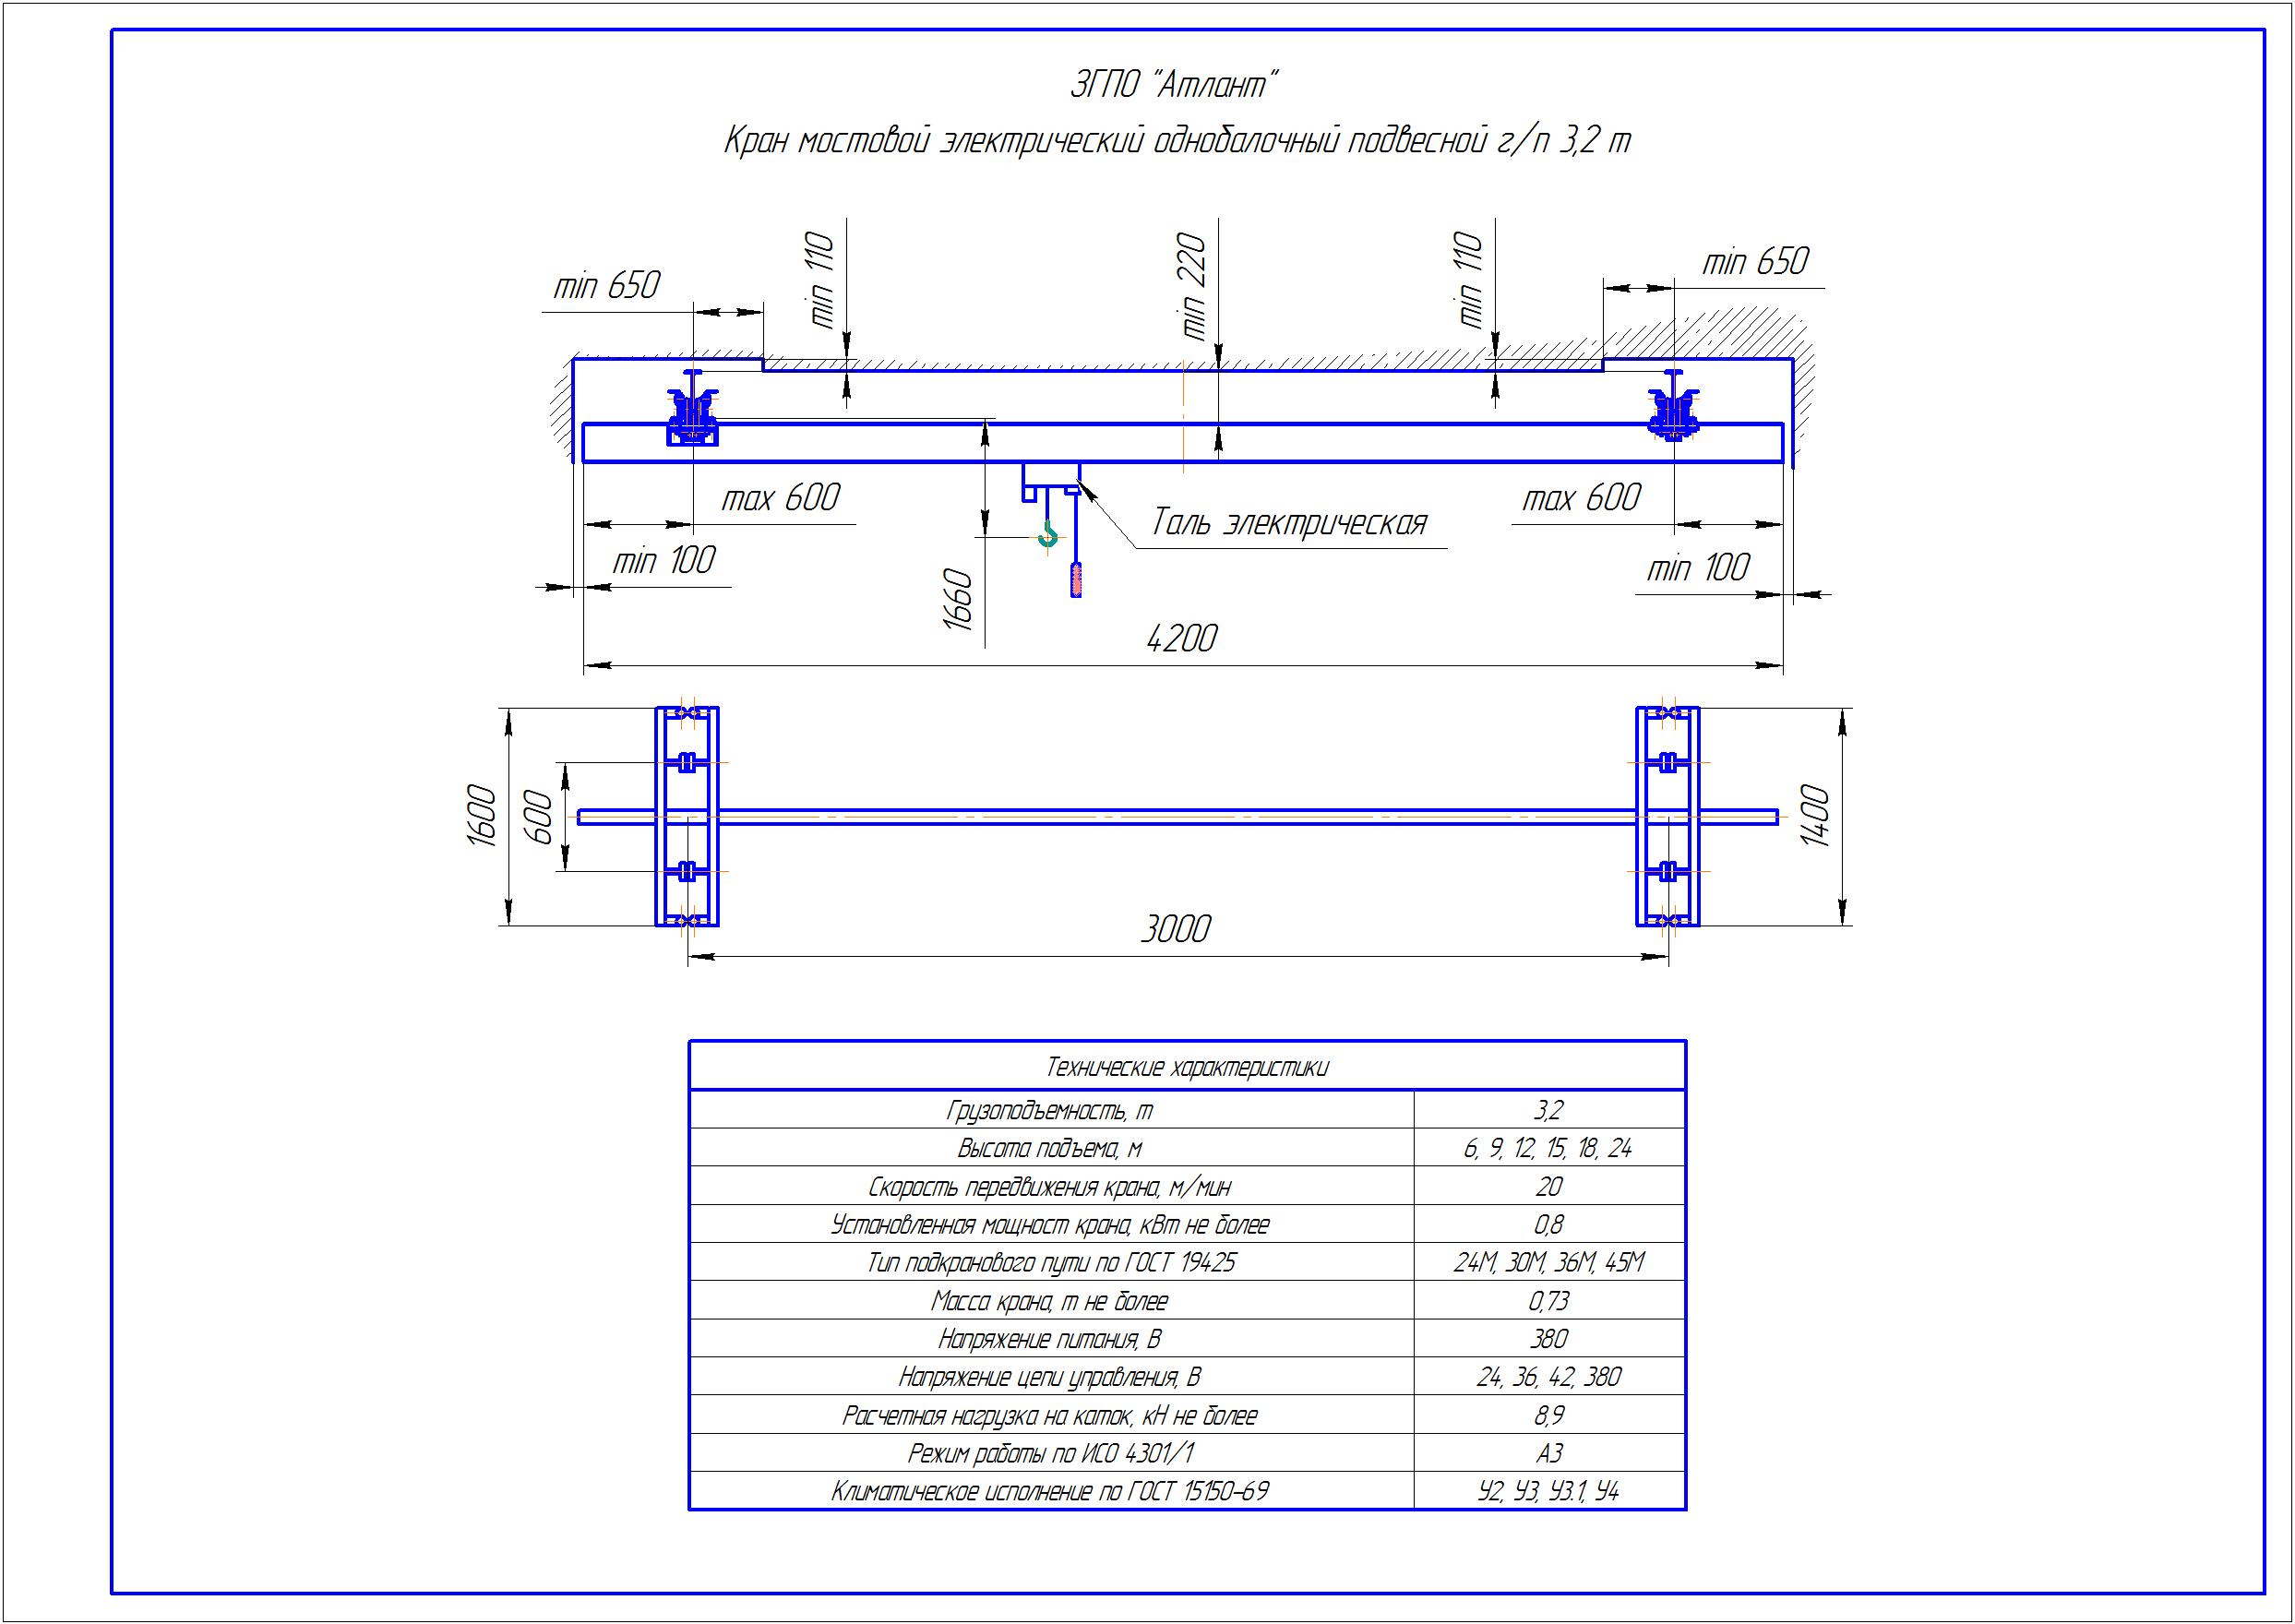 KBP 3 1 - Подвесная кран балка